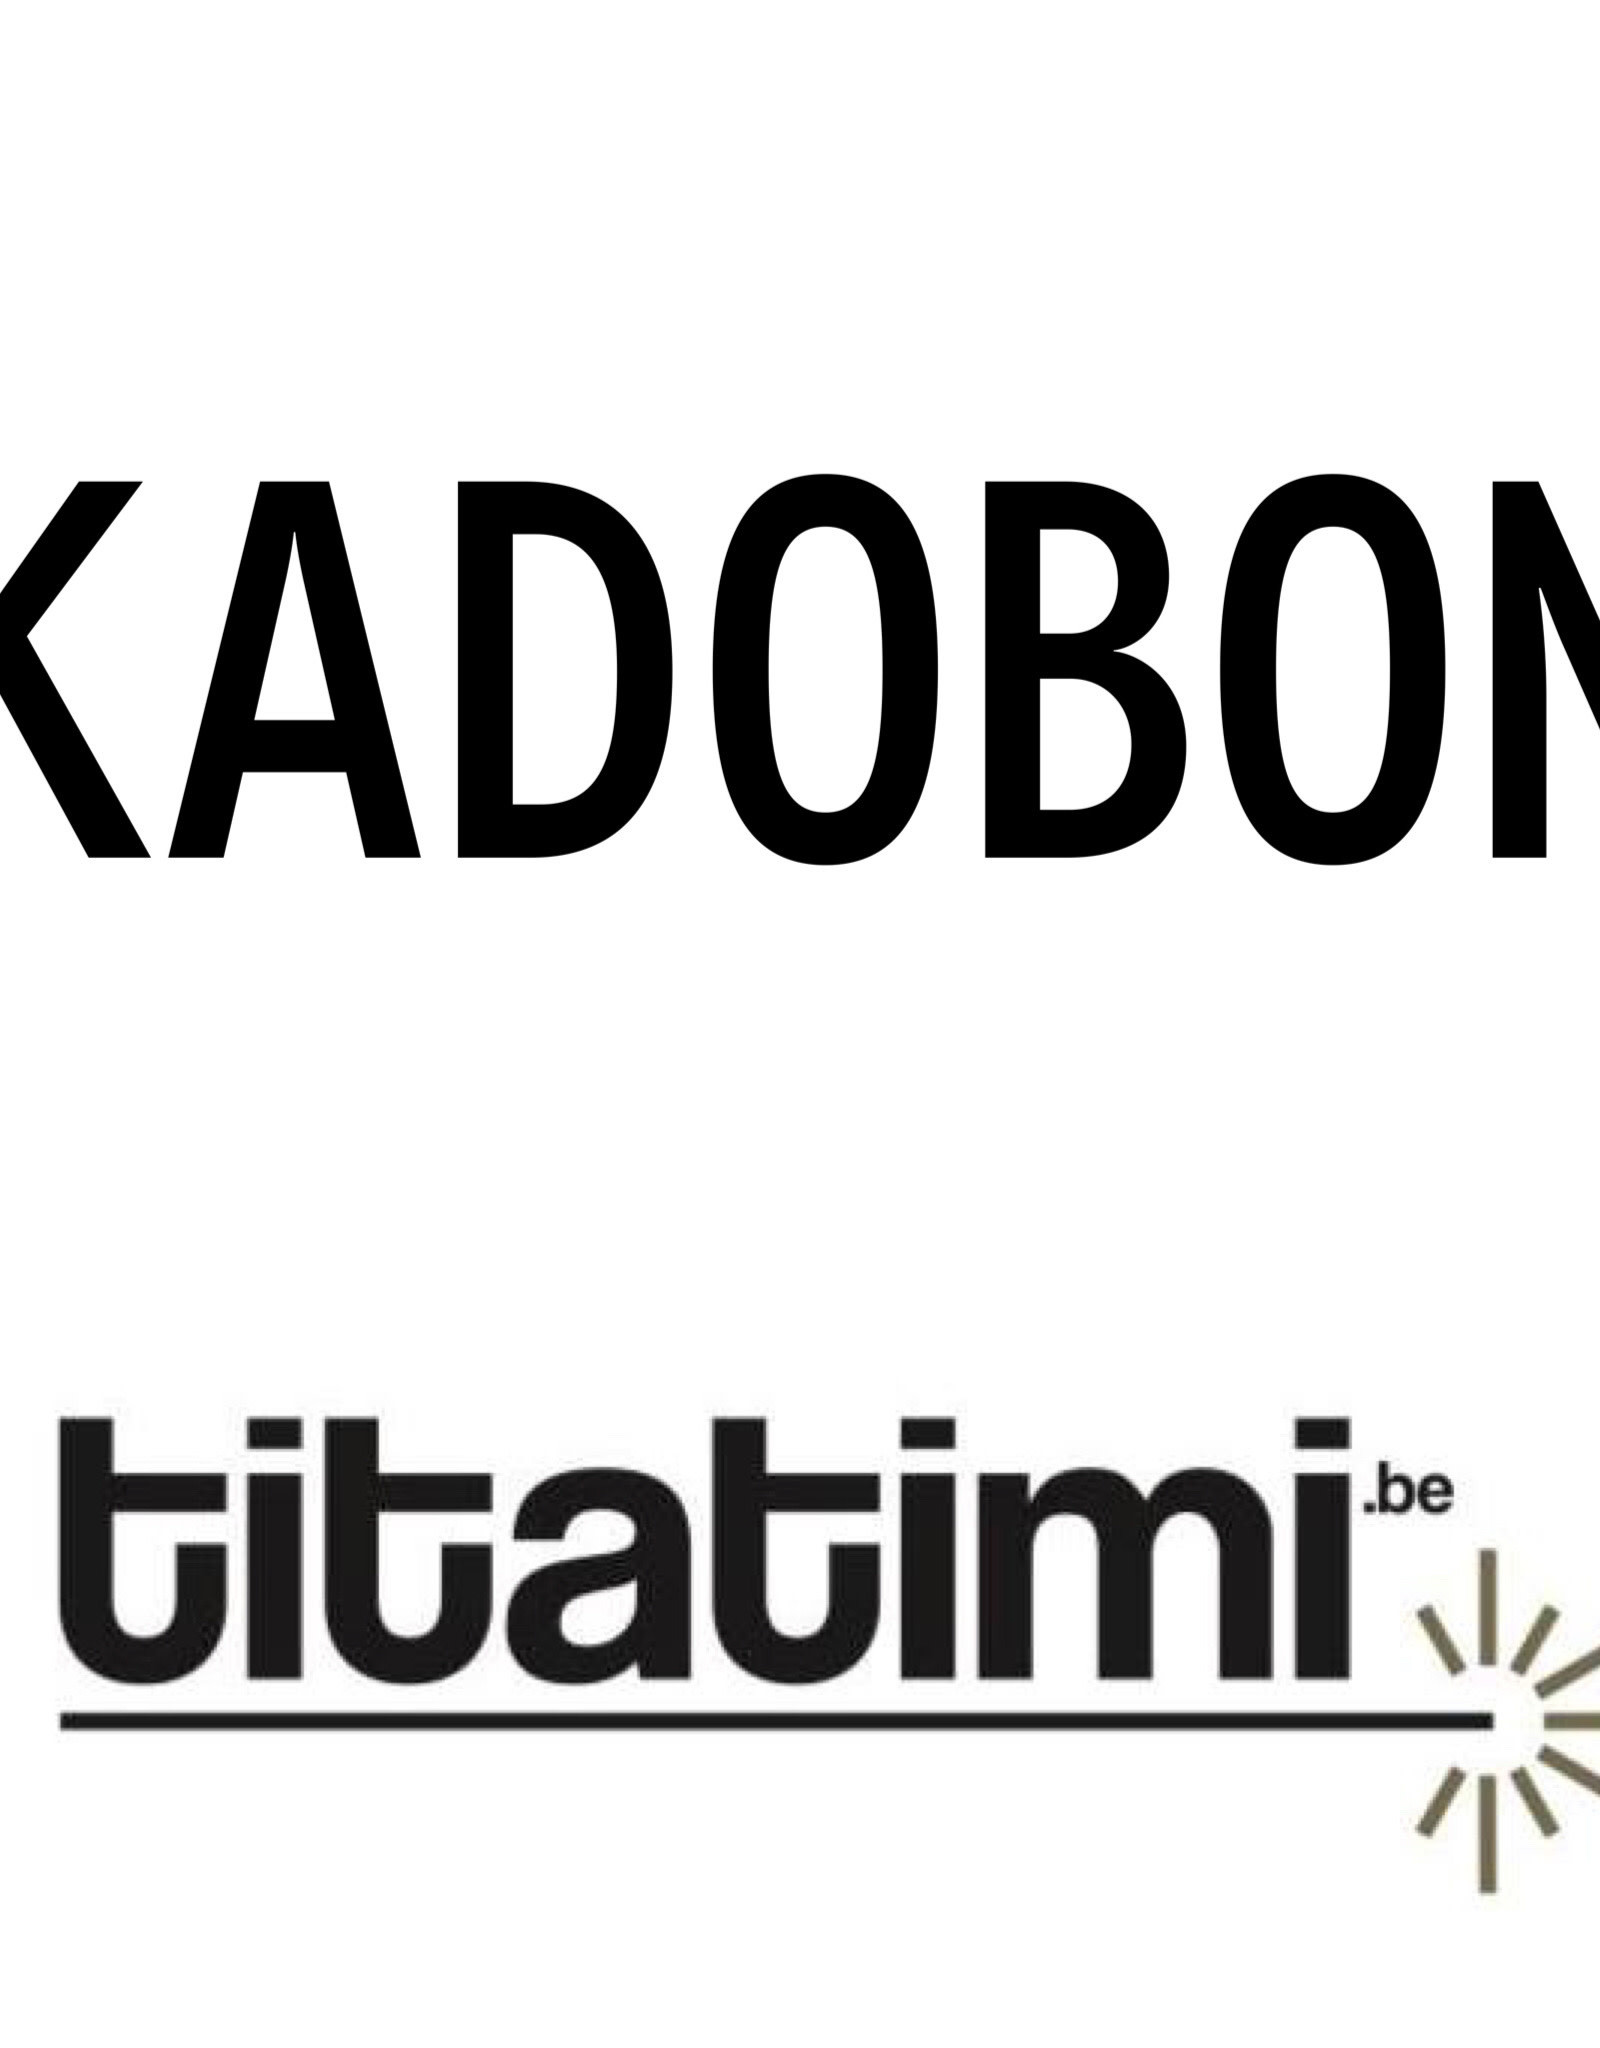 titatimi titatimi kadobon 75 euro